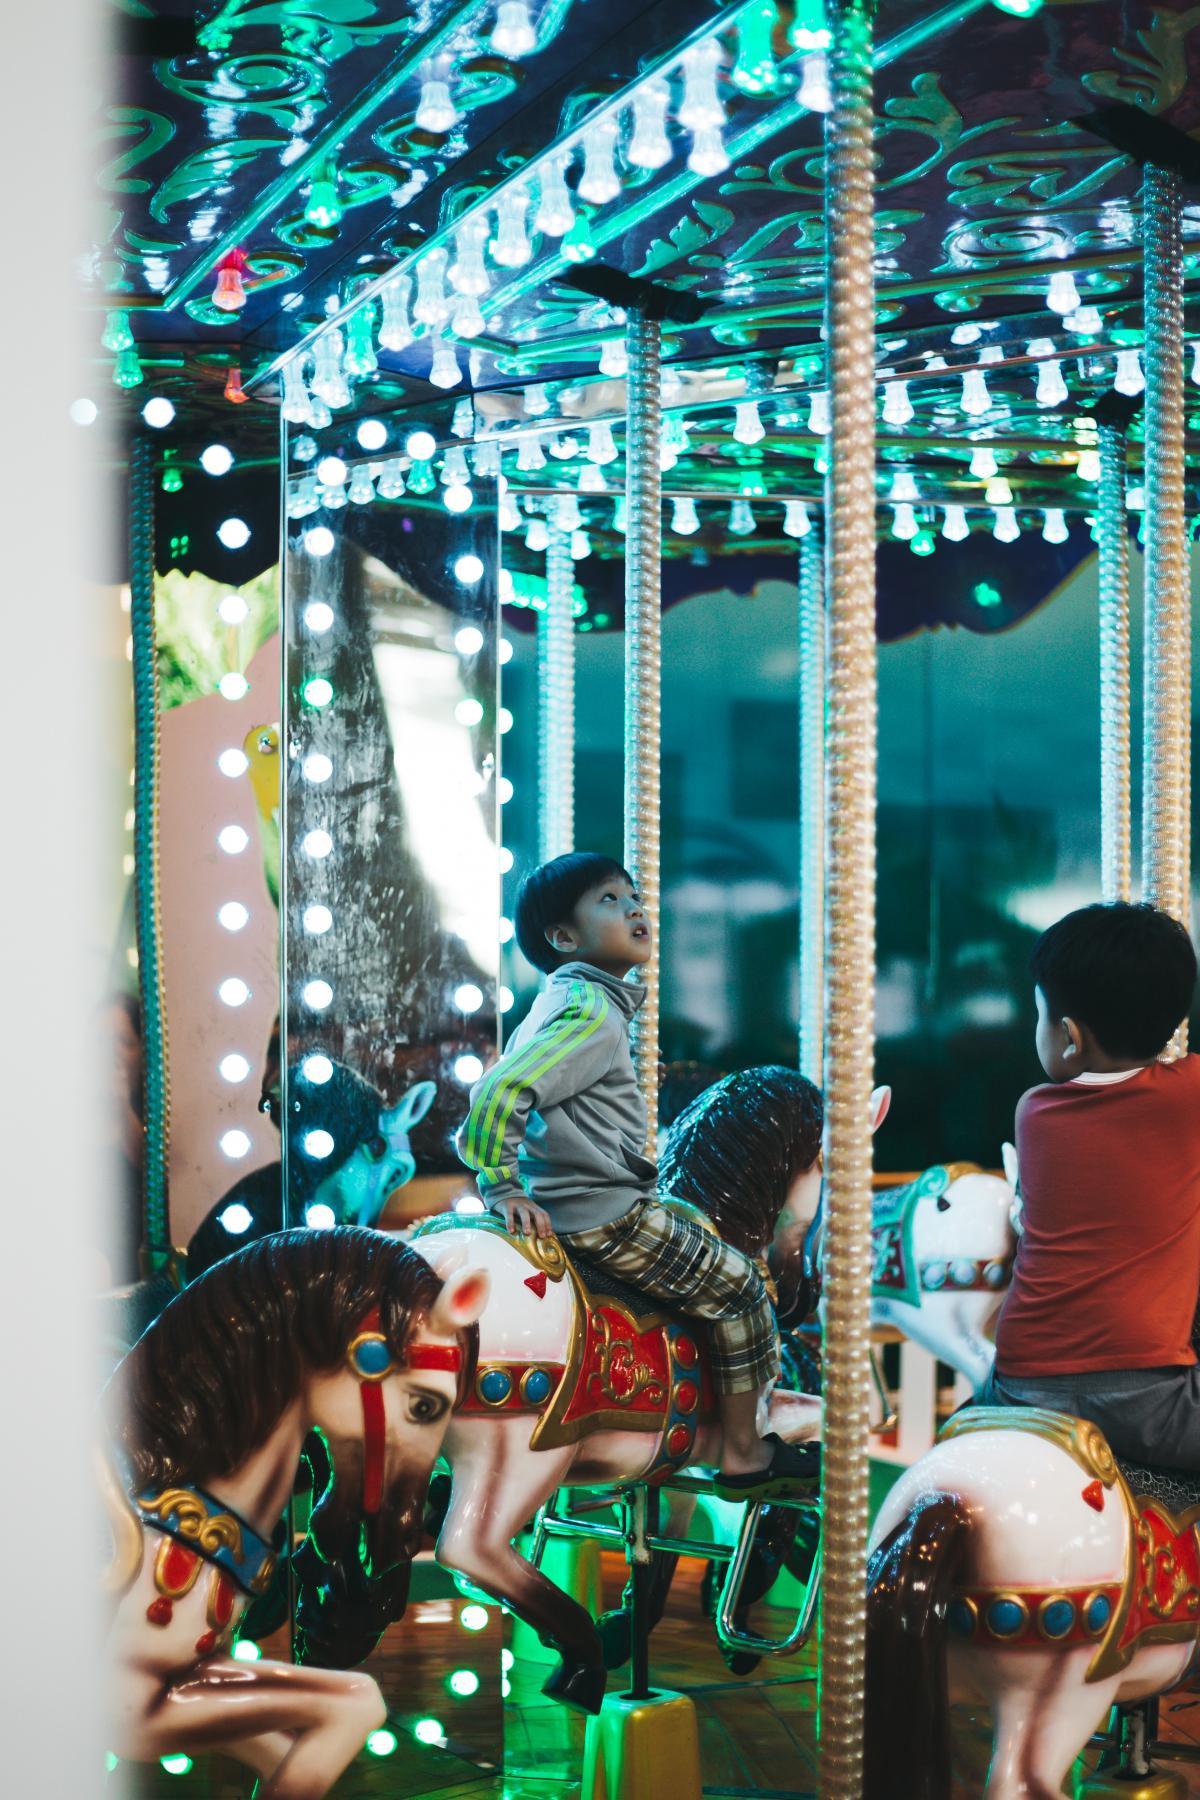 Carousel Ride Mechanical device #368184